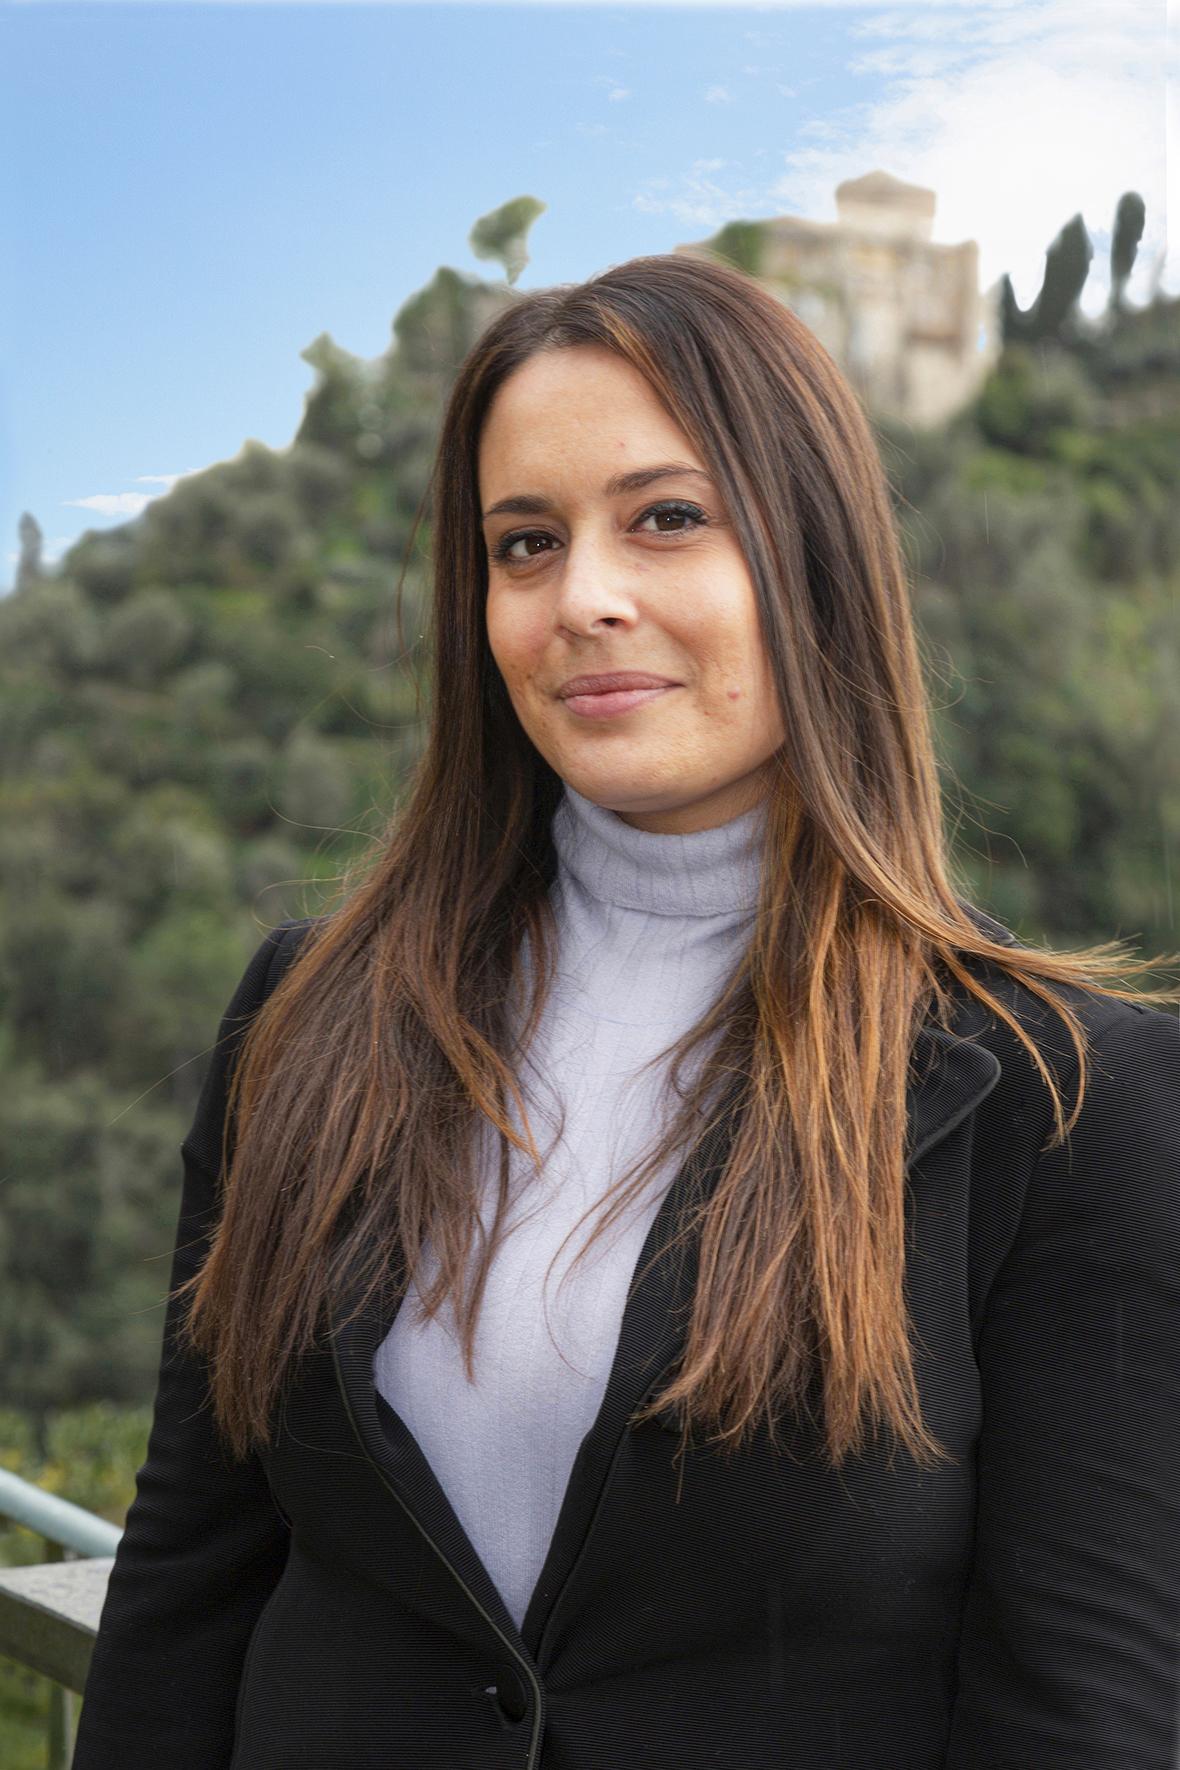 Gaia Paltenghi Reggiani